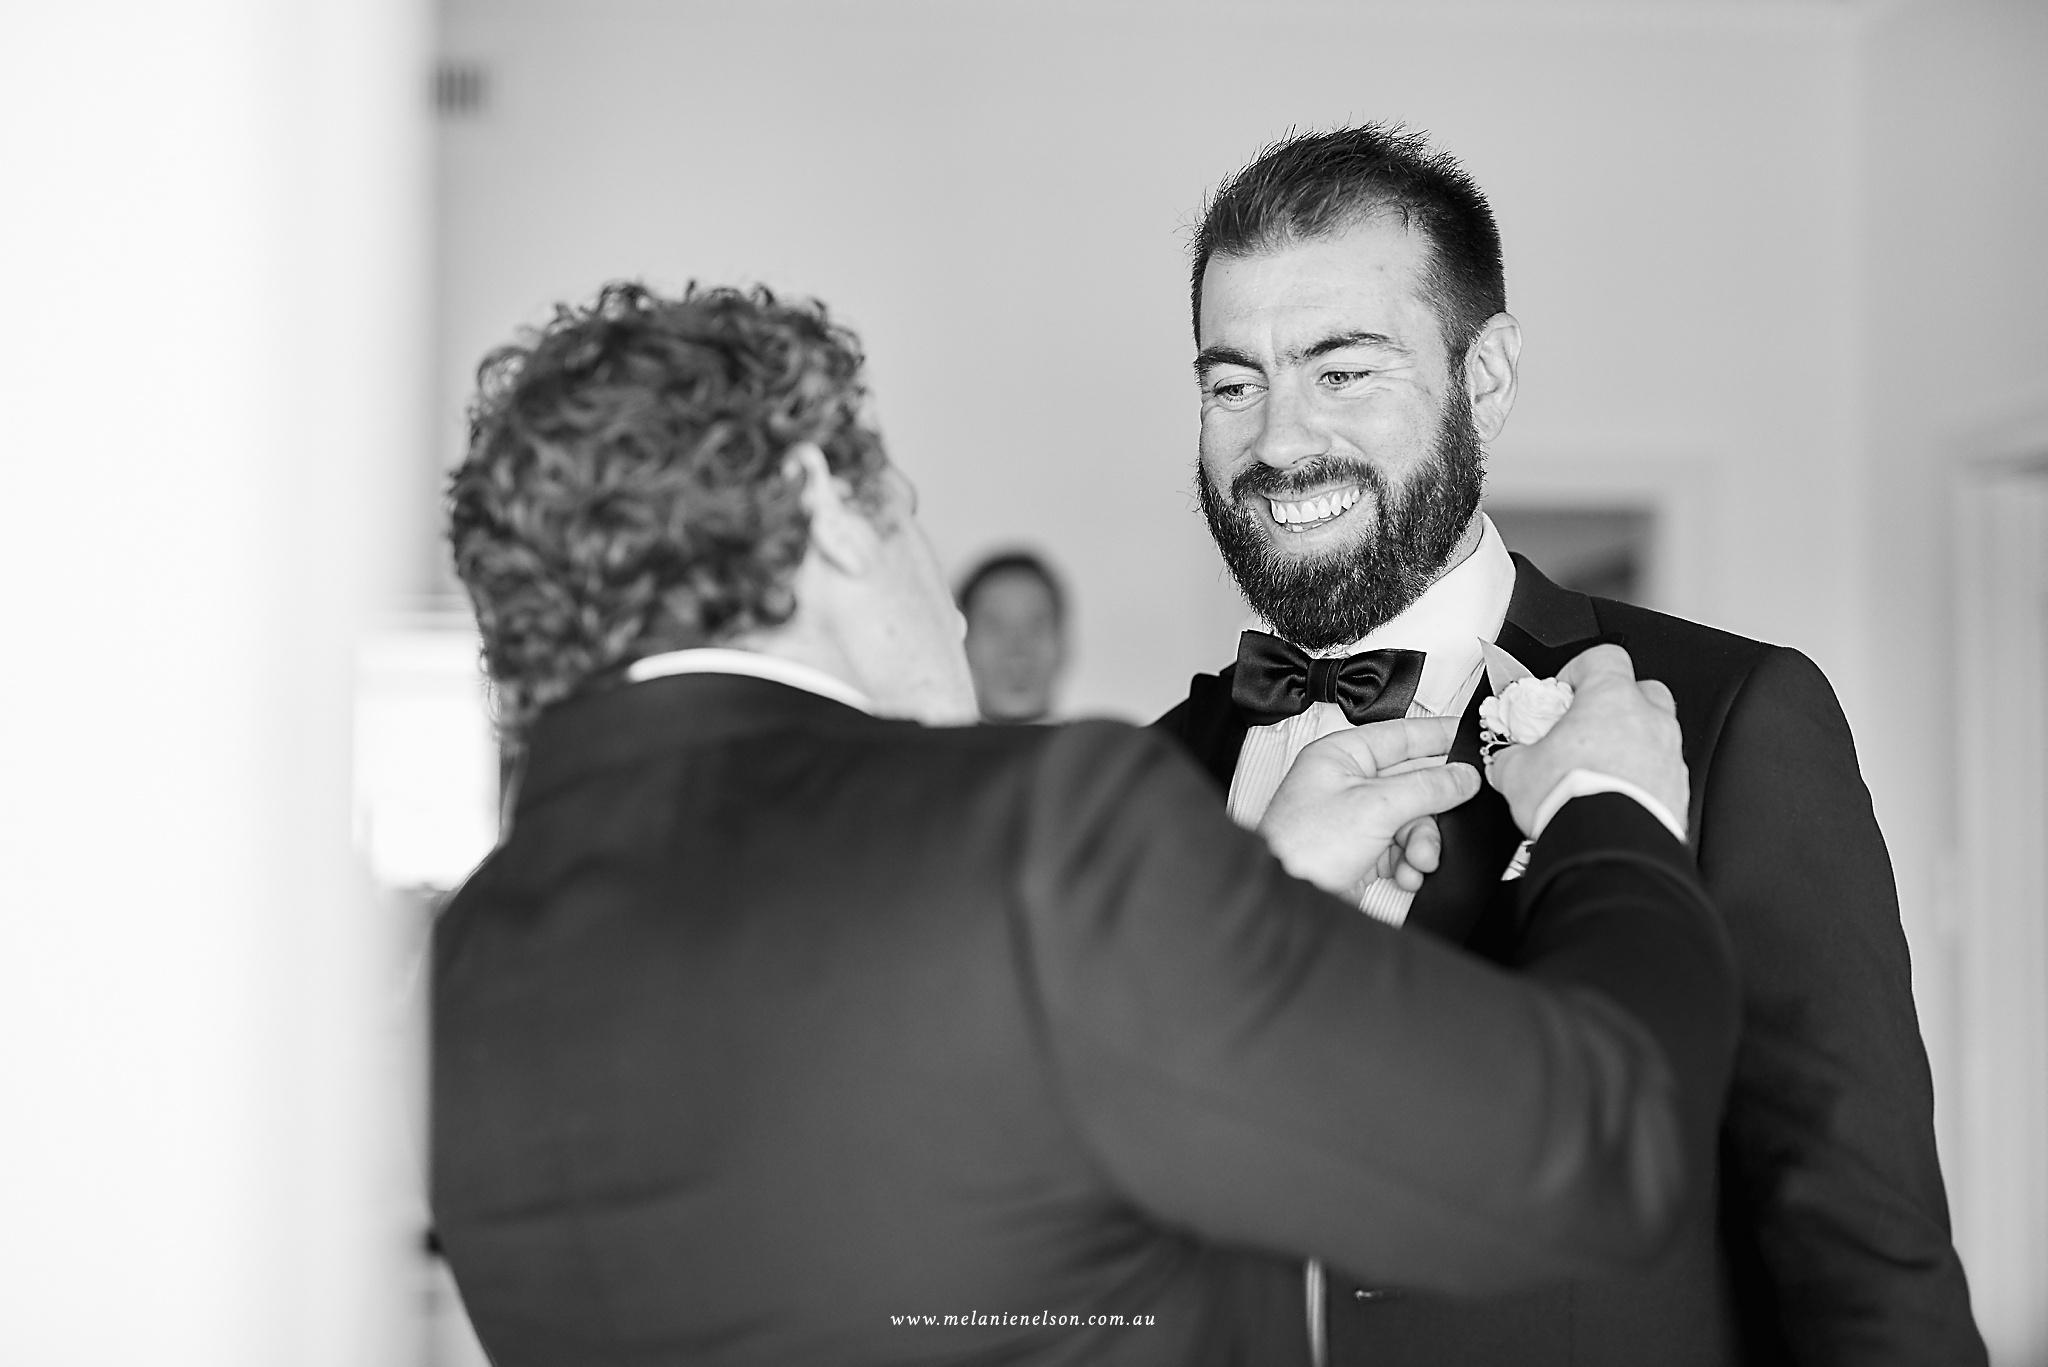 longview_vineyard_wedding_0025.jpg